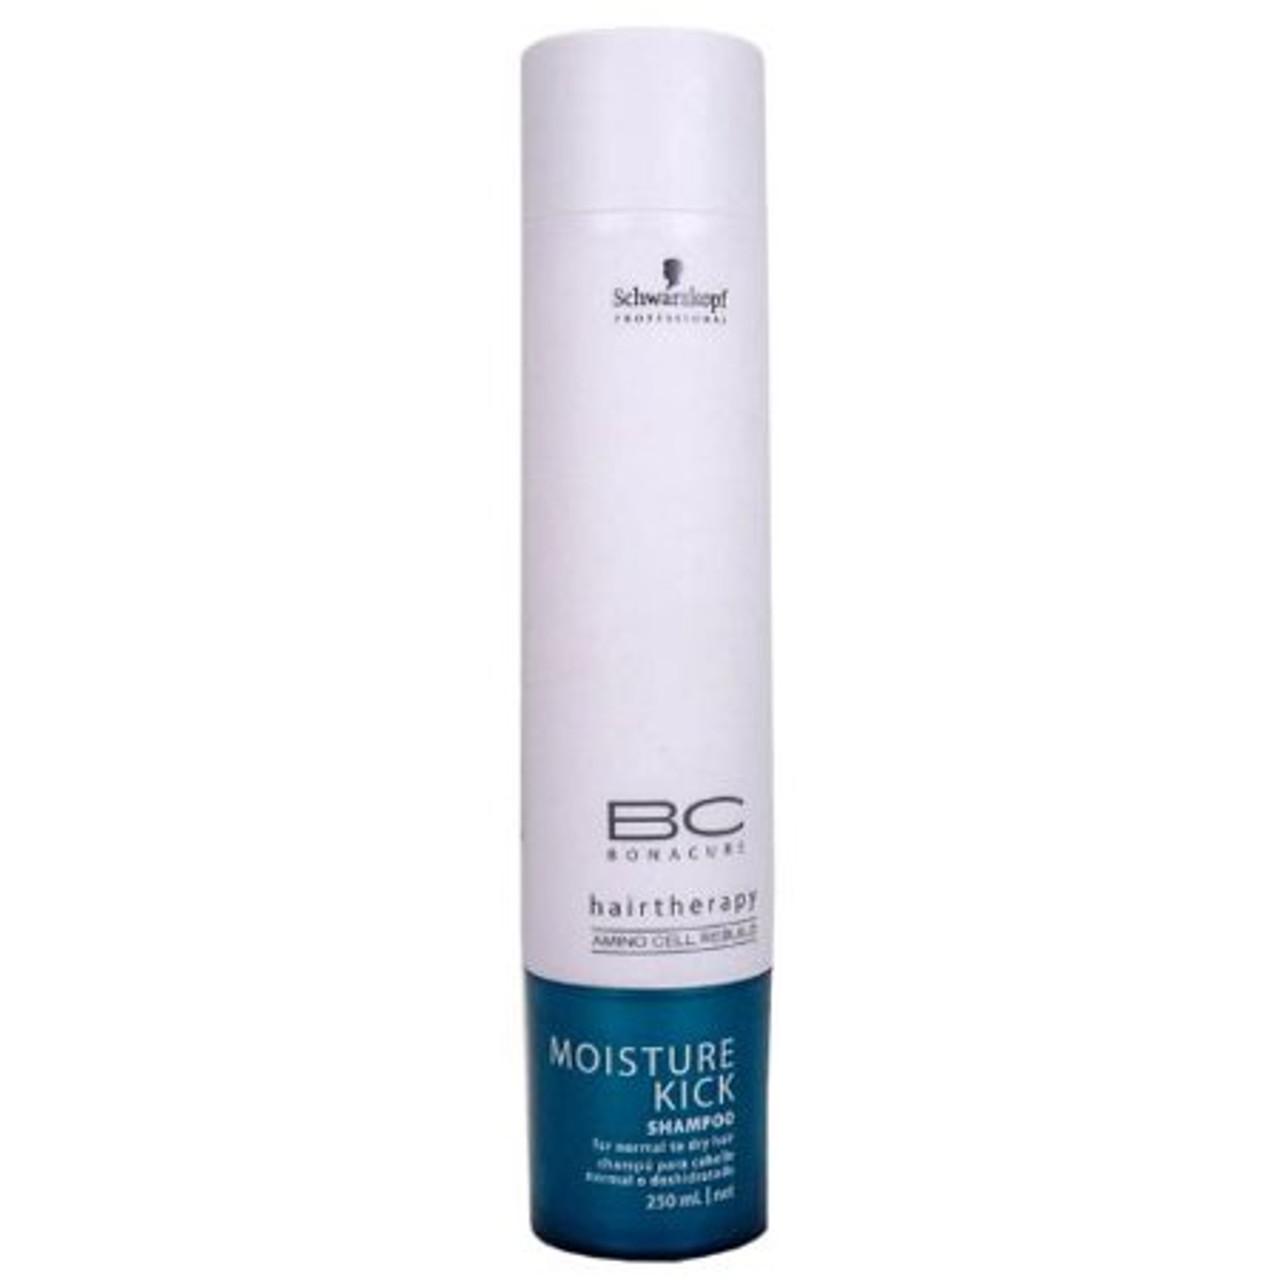 Bonacure Moisture Kick Shampoo 8.5 oz